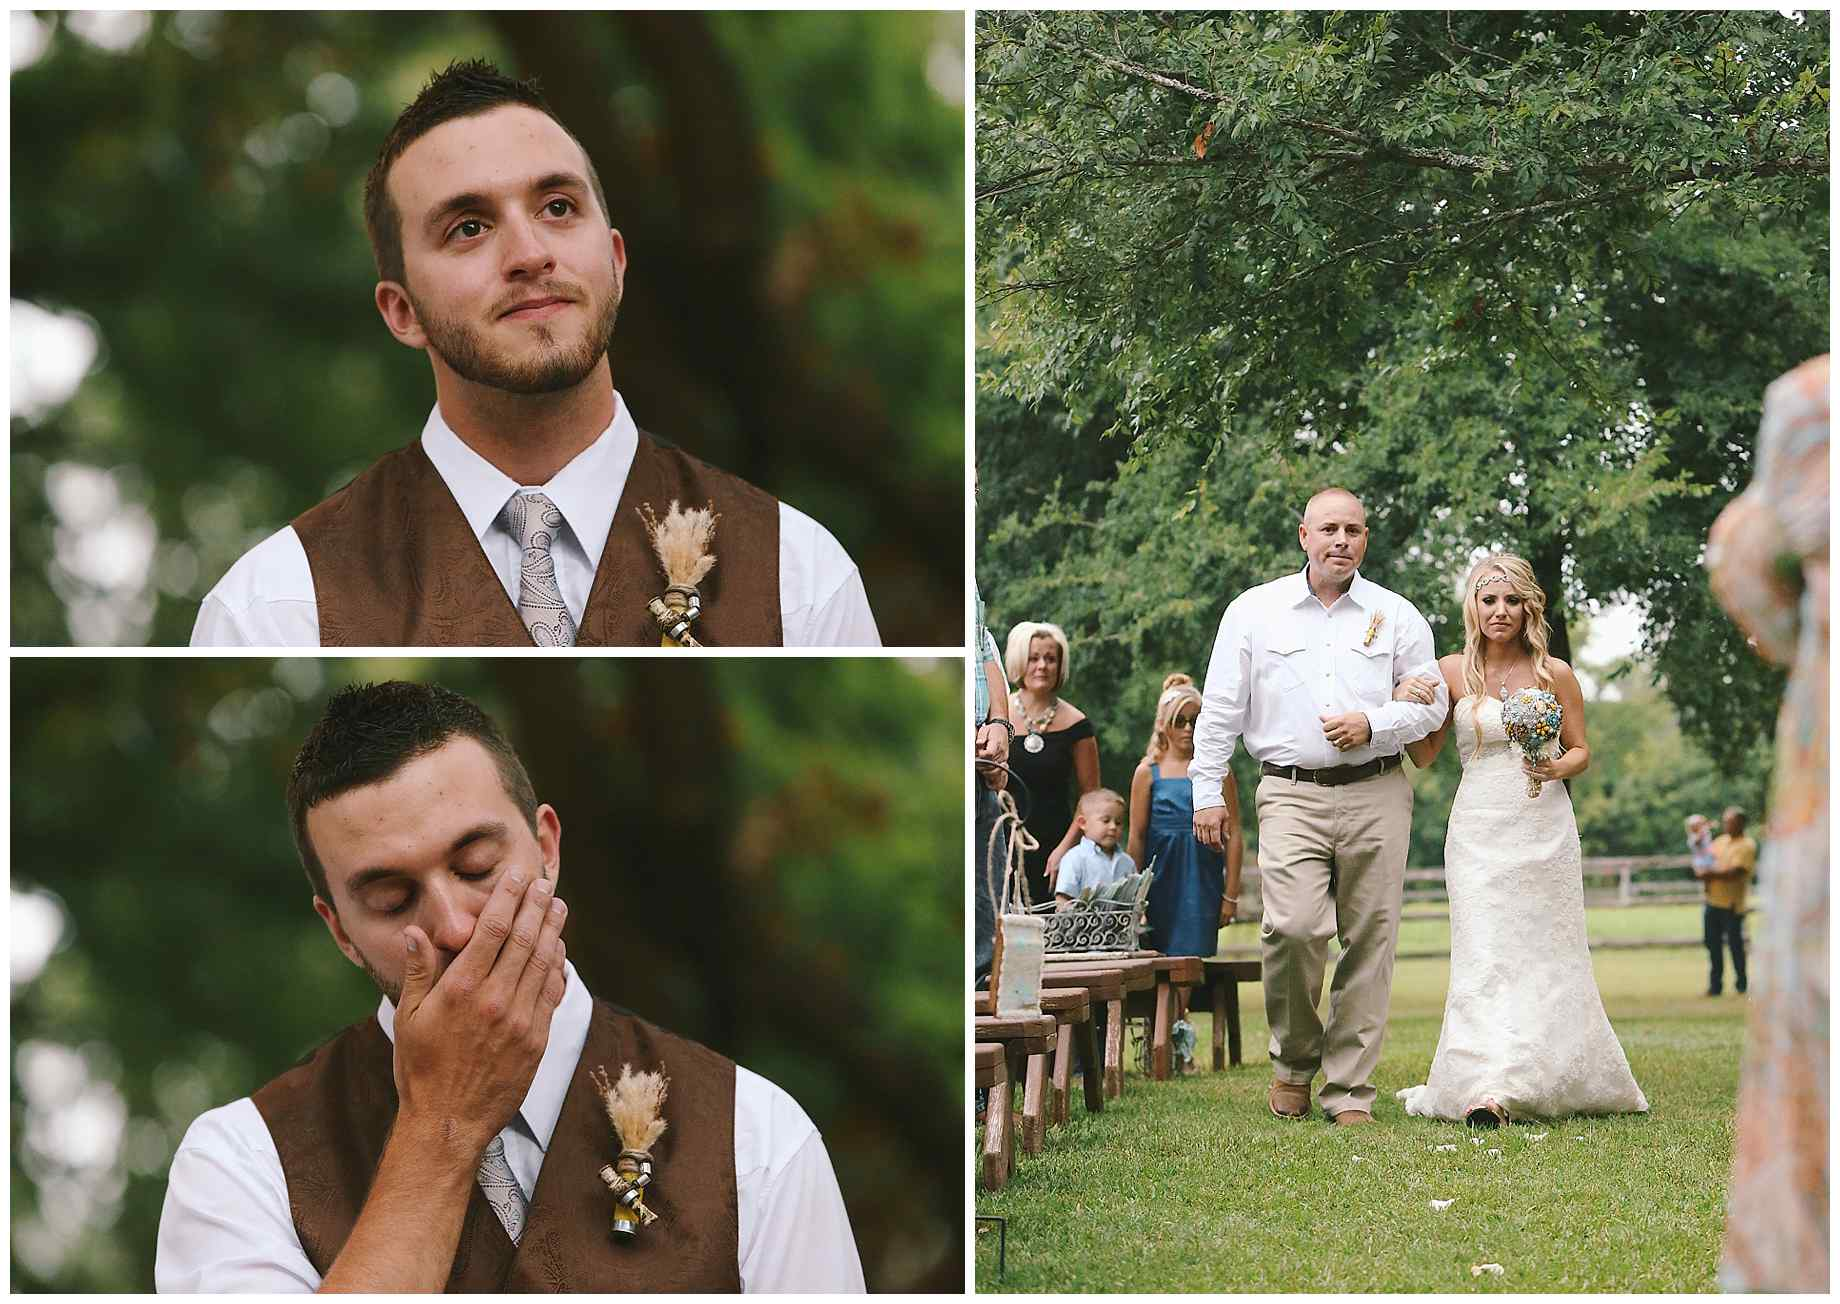 stone-oak-ranch-outdoor-wedding-015